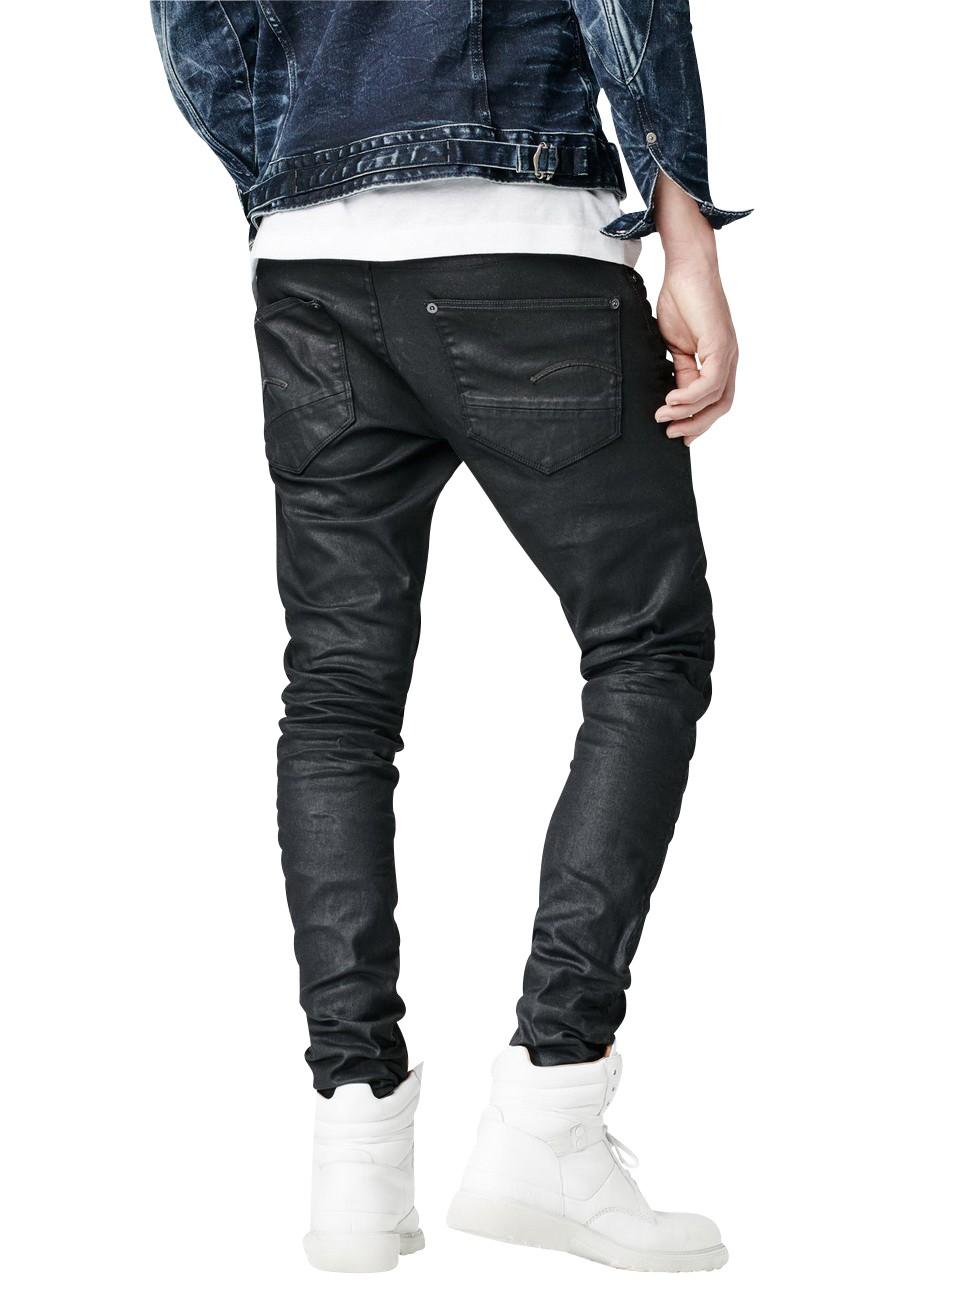 g-star-herren-jeans-revend-super-slim-fit-3d-dark-aged, 35.00 EUR @ jeans